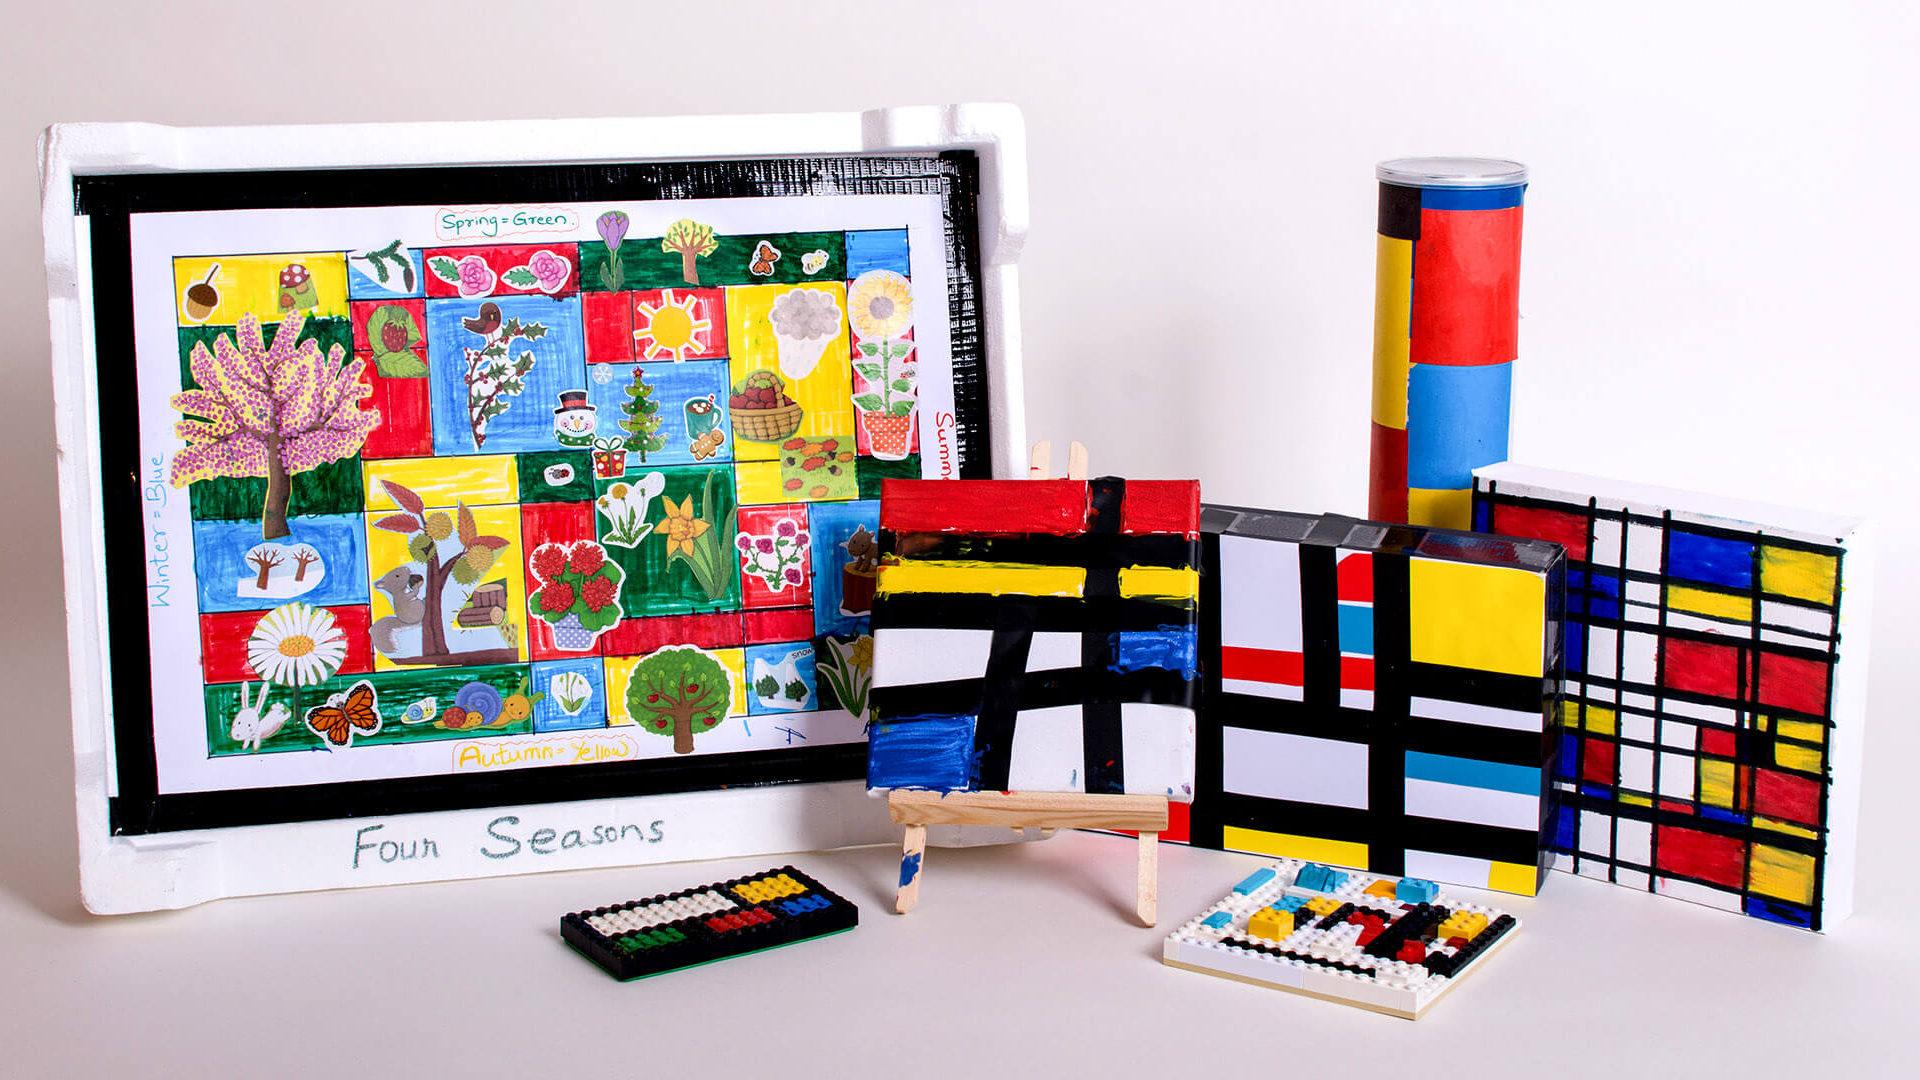 Photographing the children's Mondrian models